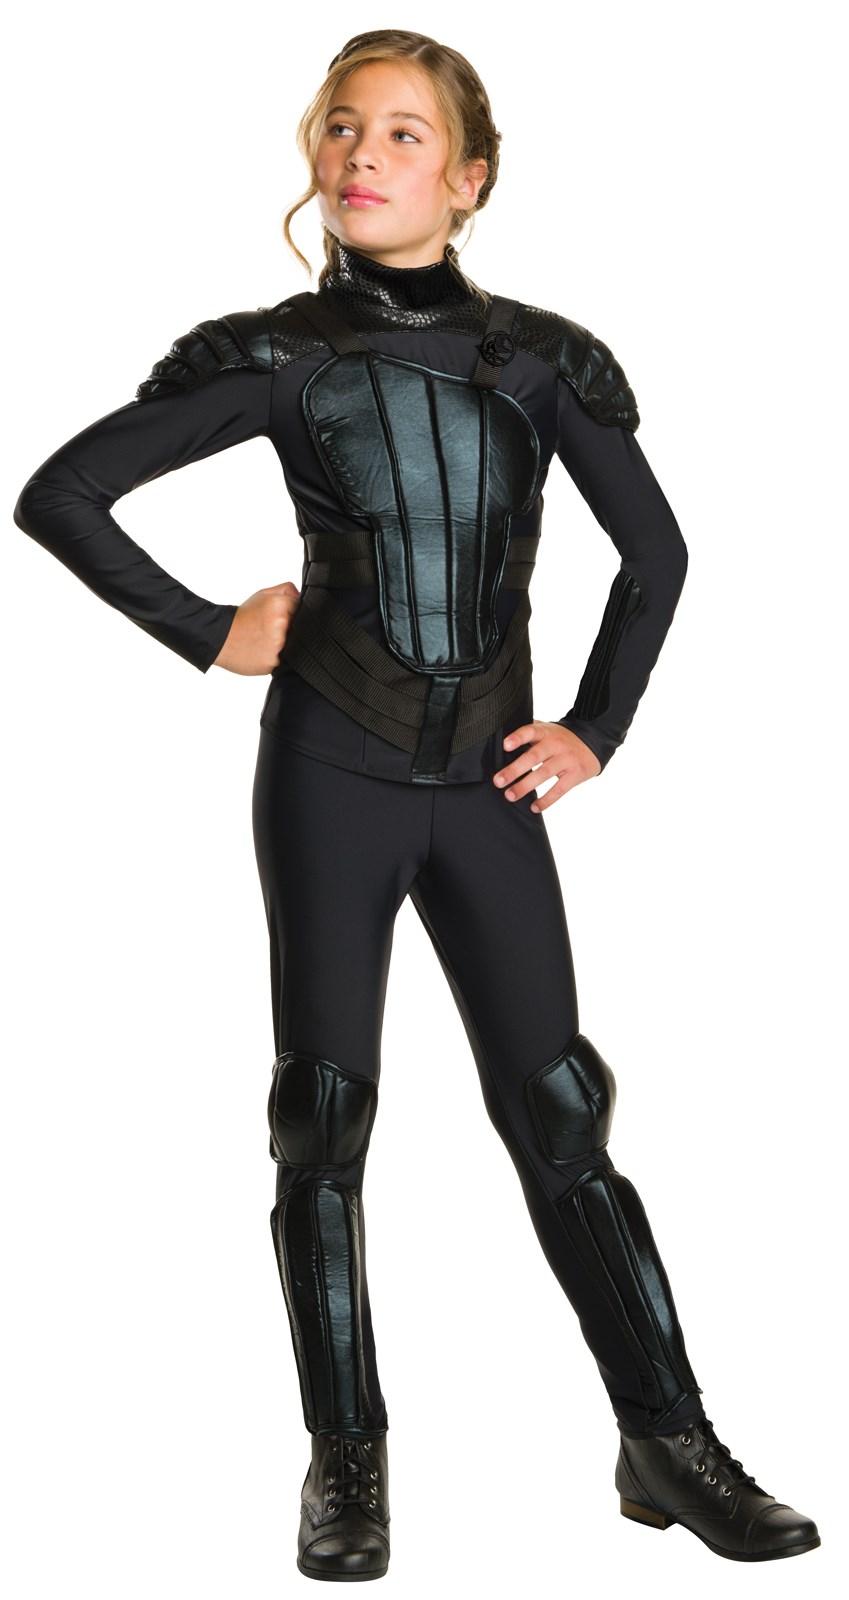 The Hunger Games: Mockingjay Part 2 Deluxe Tween Katniss Costume